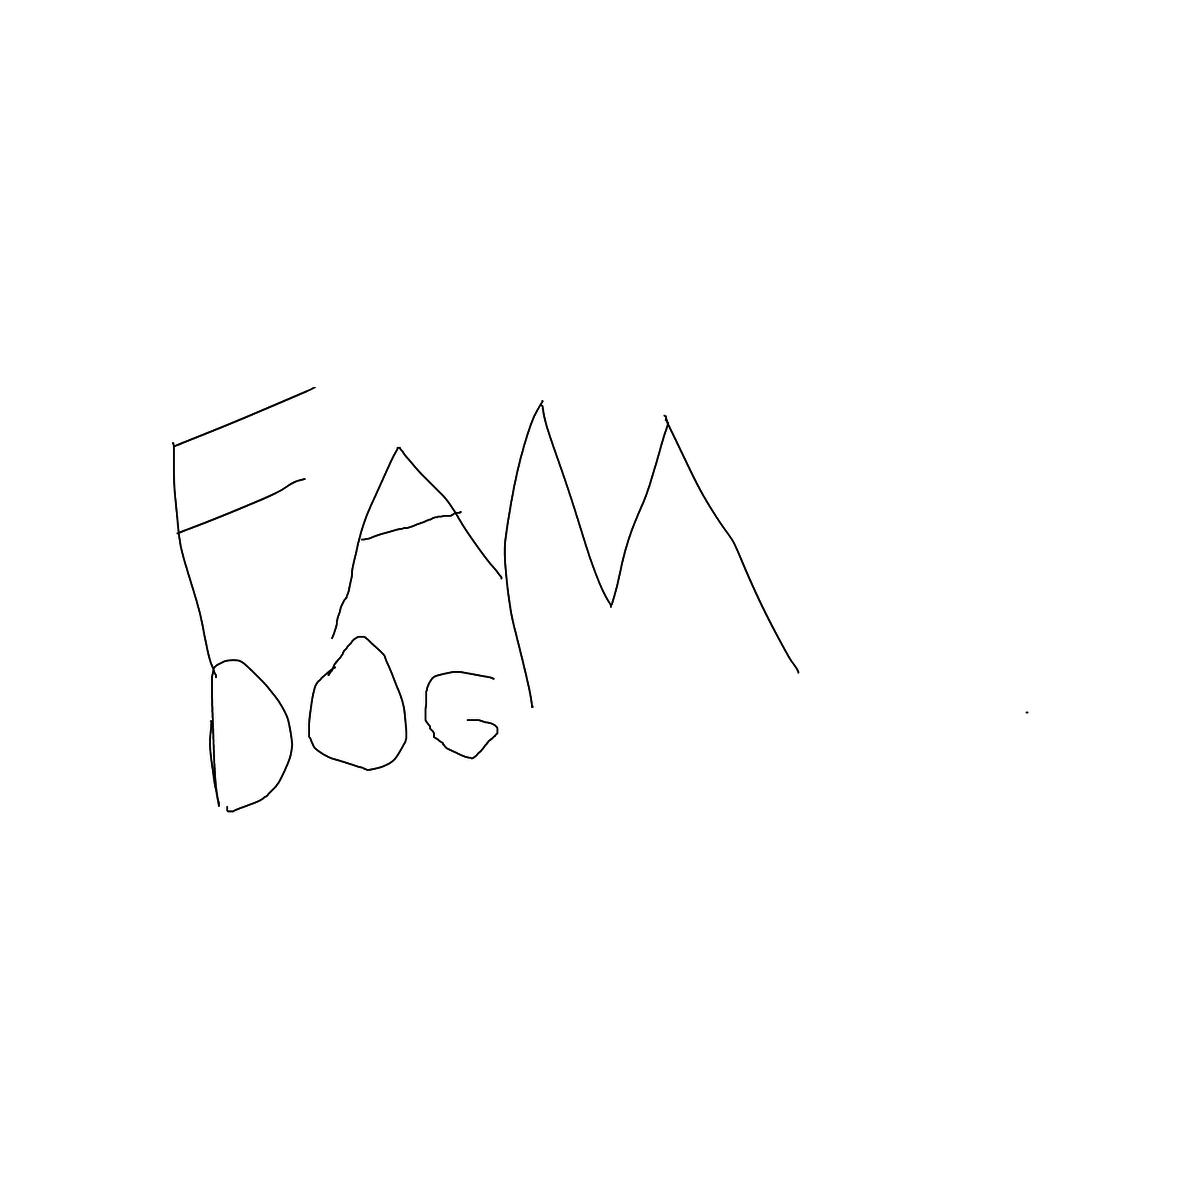 BAAAM drawing#24099 lat:41.5286979675293000lng: -81.4509811401367200